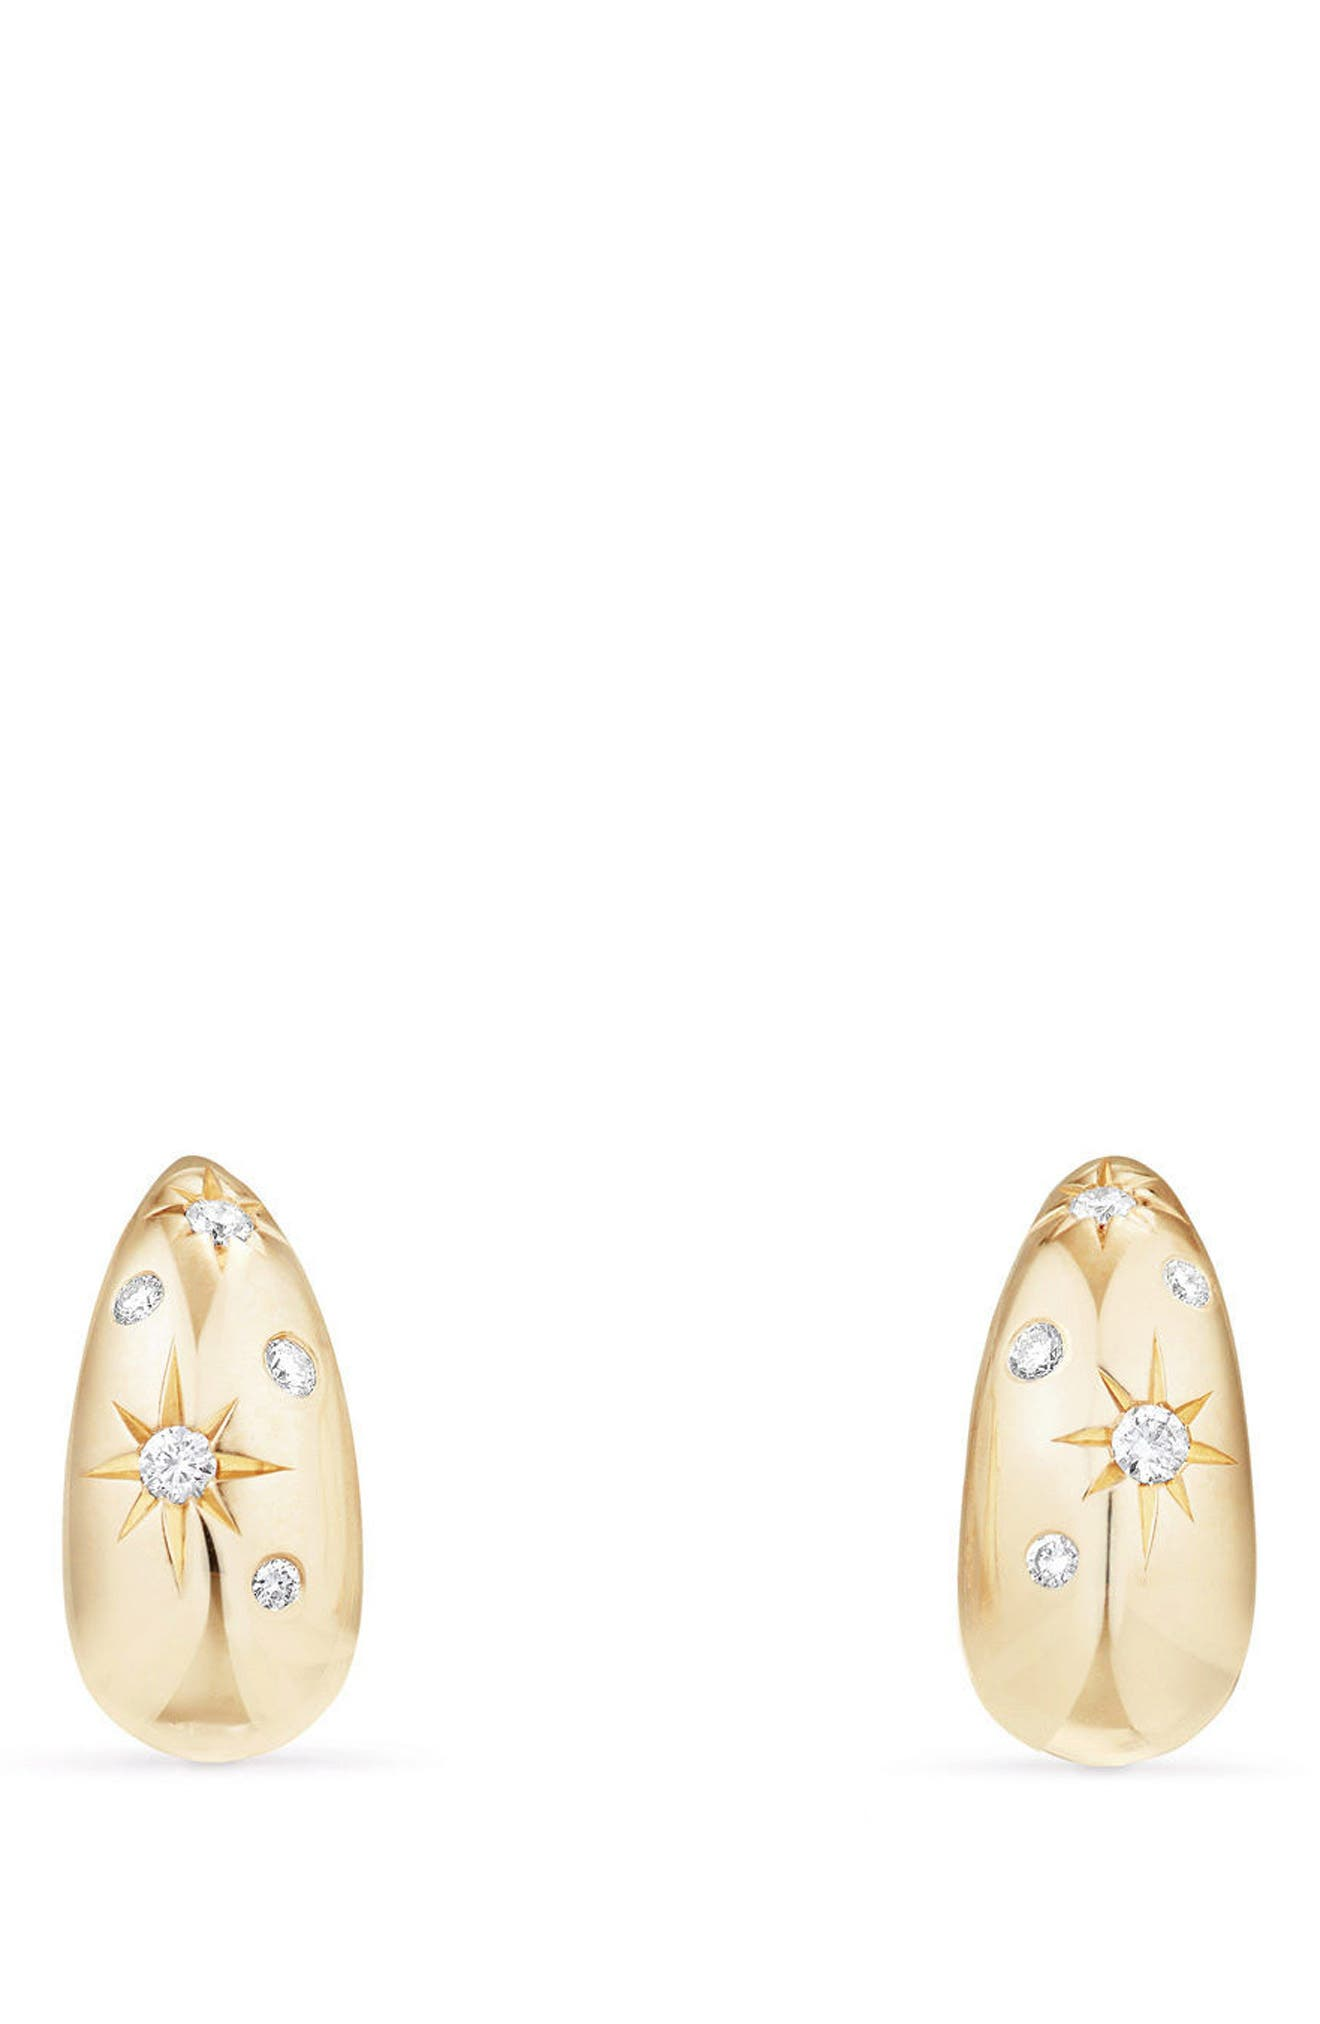 David Yurman Pure Form Pod Earrings with Diamonds in 18K Gold, 15mm